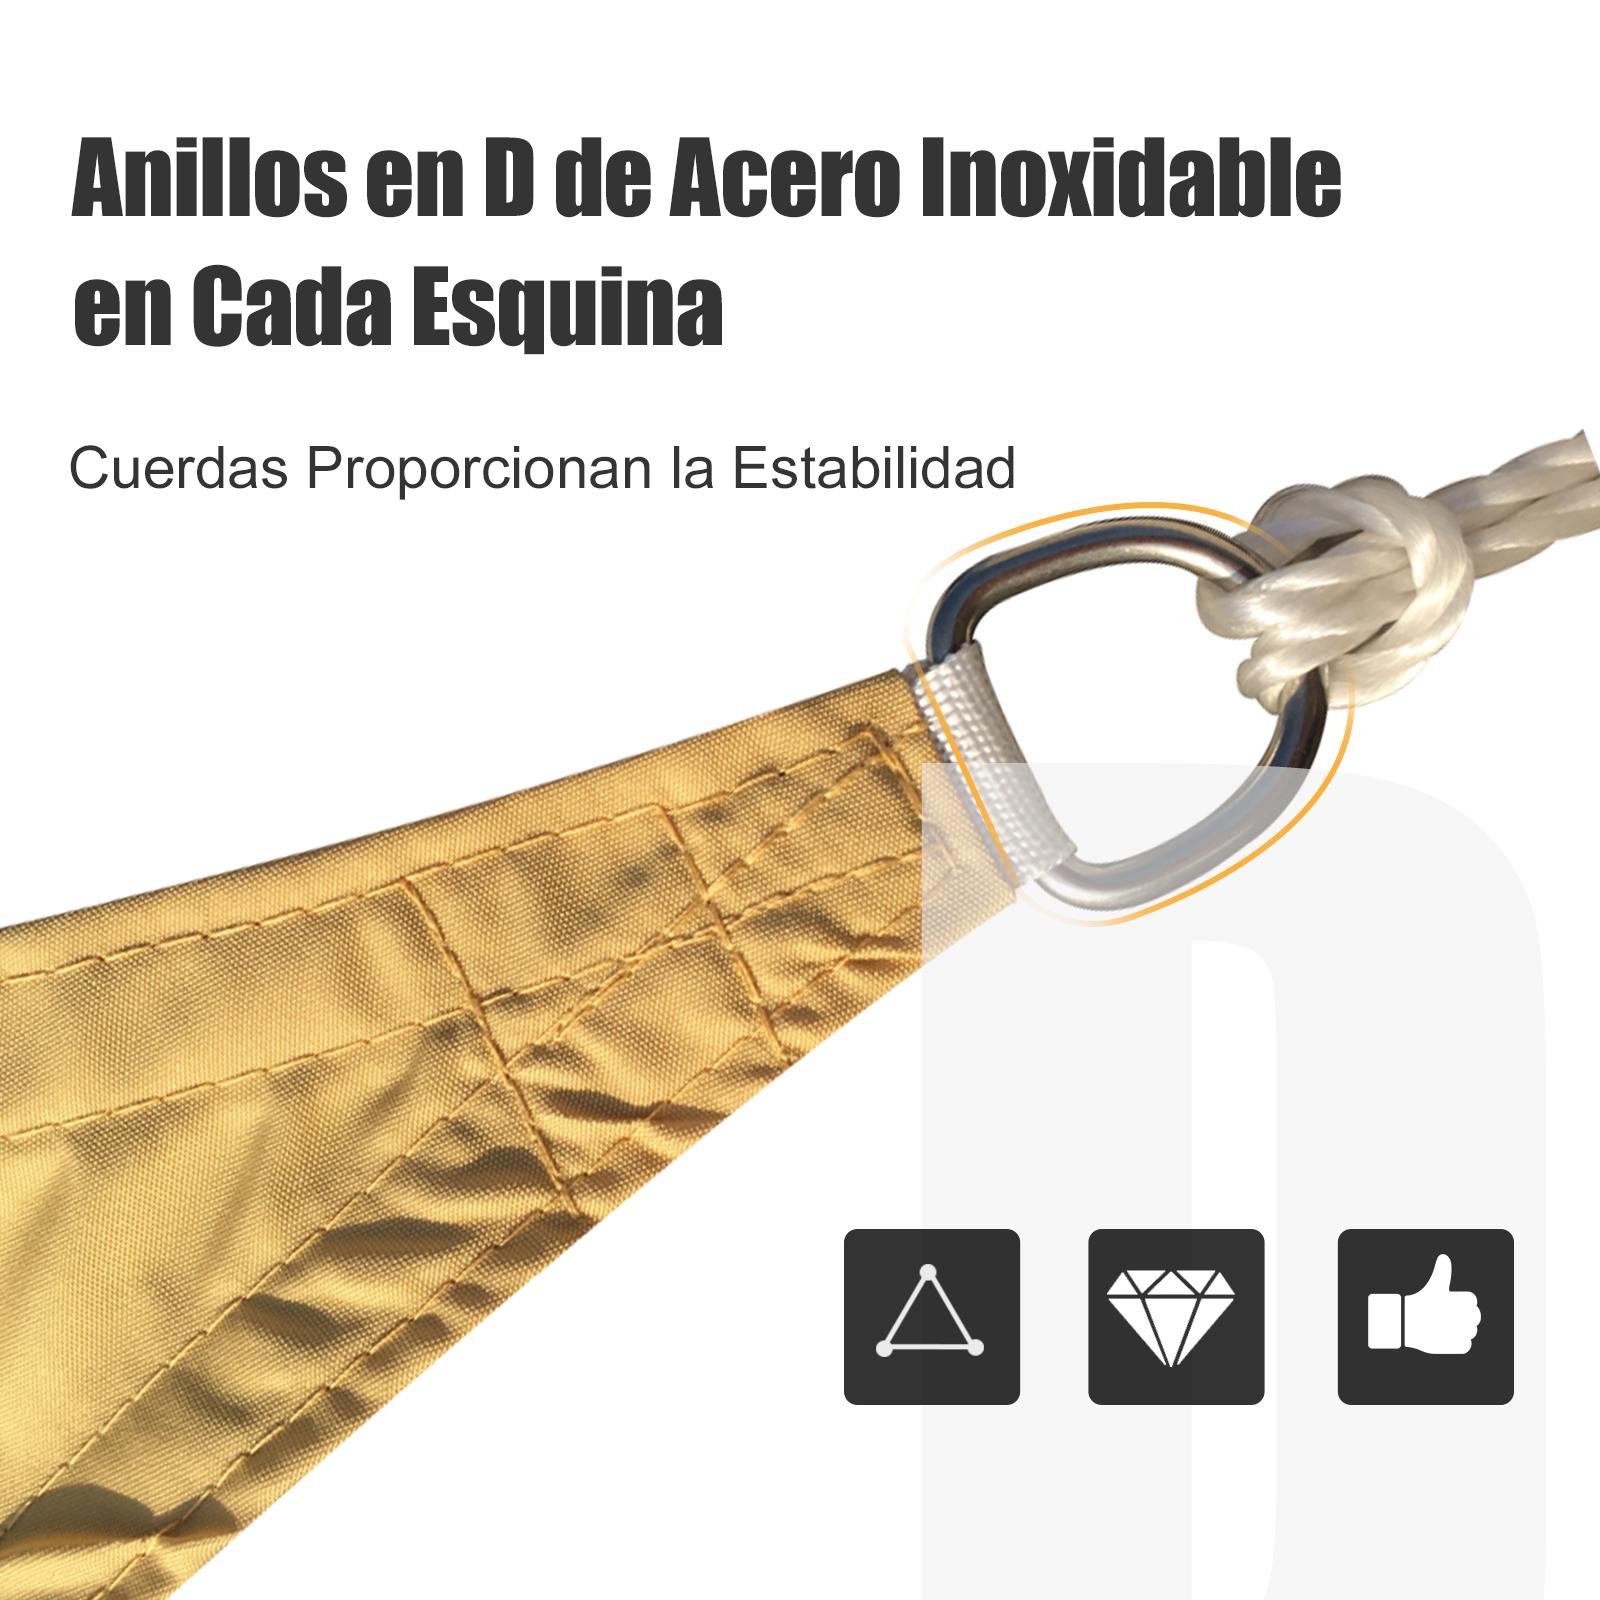 Toldo-Vela-Sombrilla-Parasol-Triangulo-Tejido-de-Poliester-160g-m2-Jardin-Playa miniatura 6